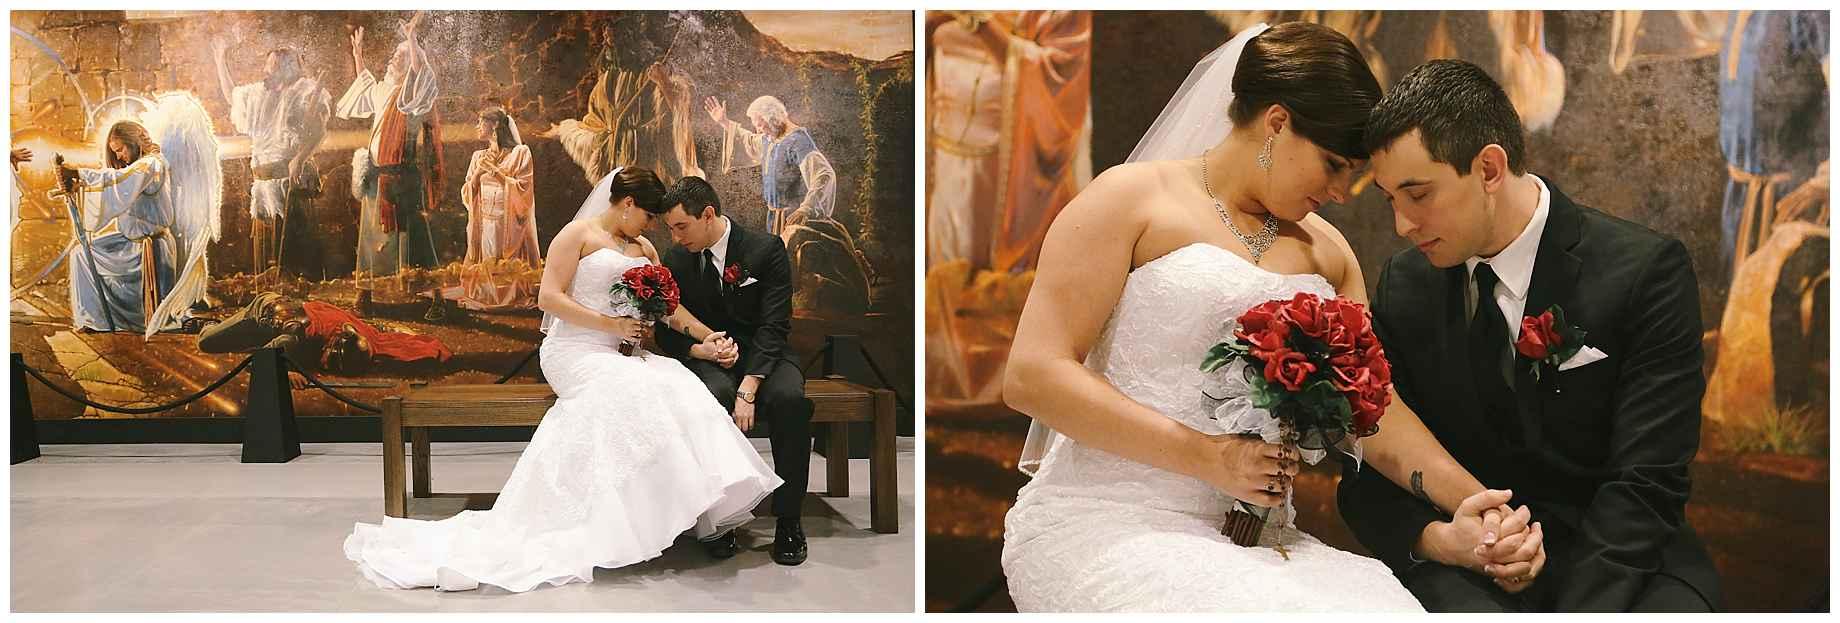 museum-of-biblical-art-wedding-photos-05